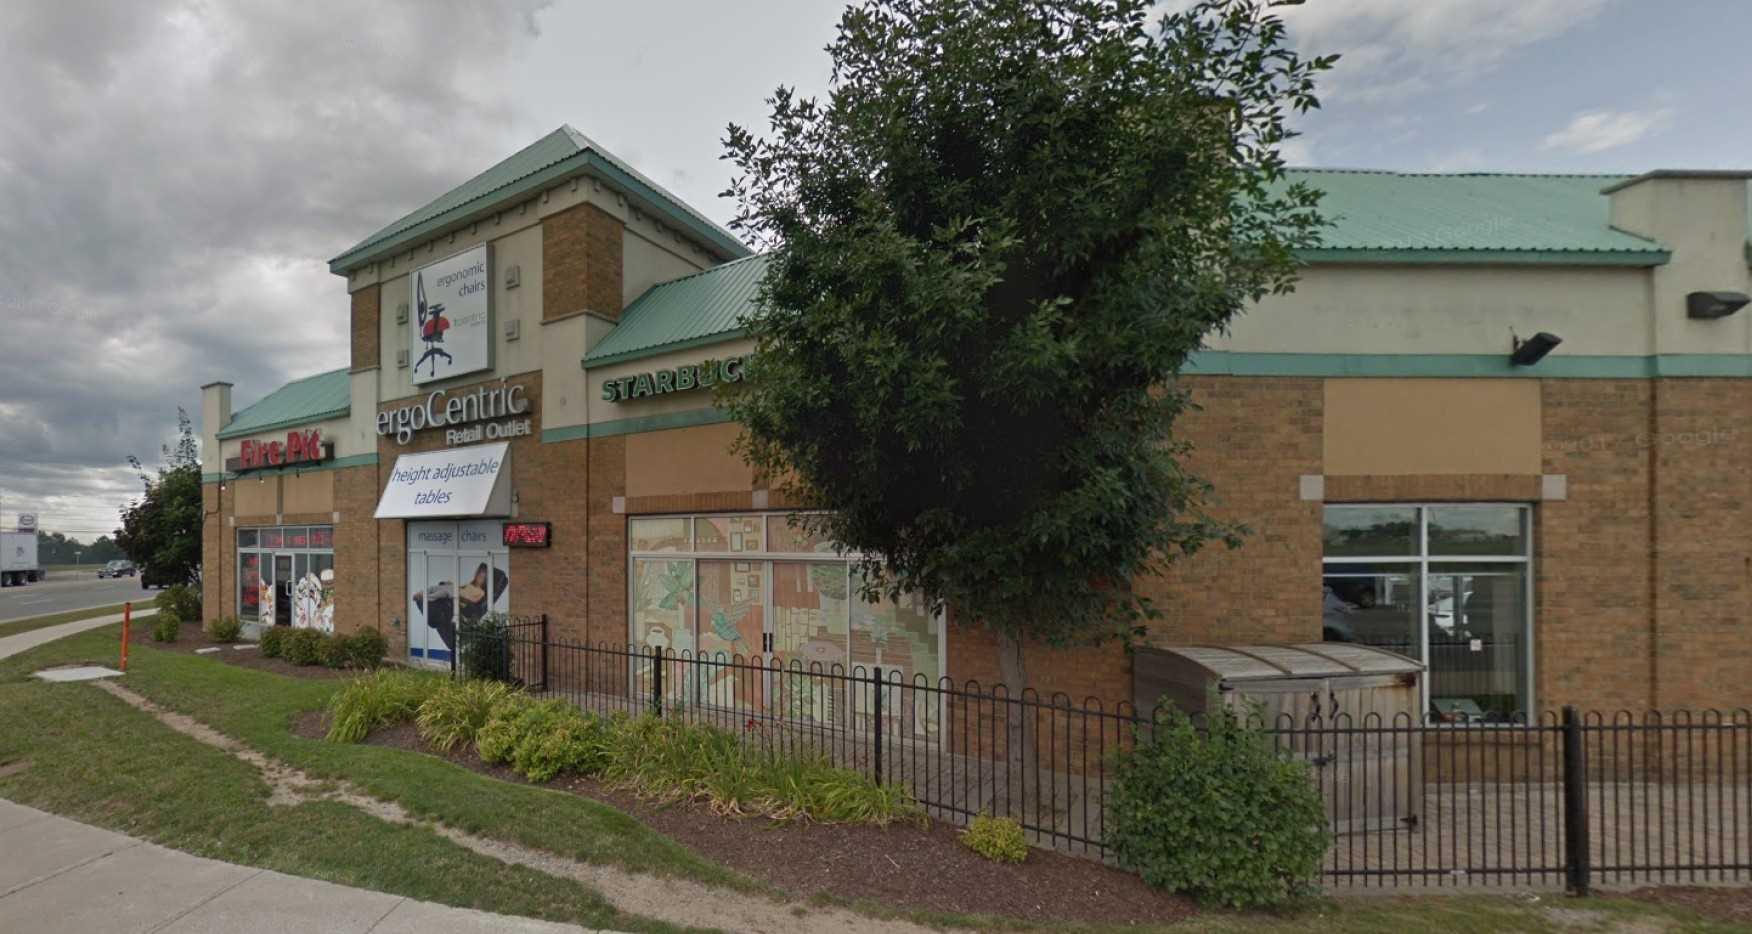 6020 Hurontario St, Mississauga, Ontario  L5R 4B - Photo 1 - W4651650